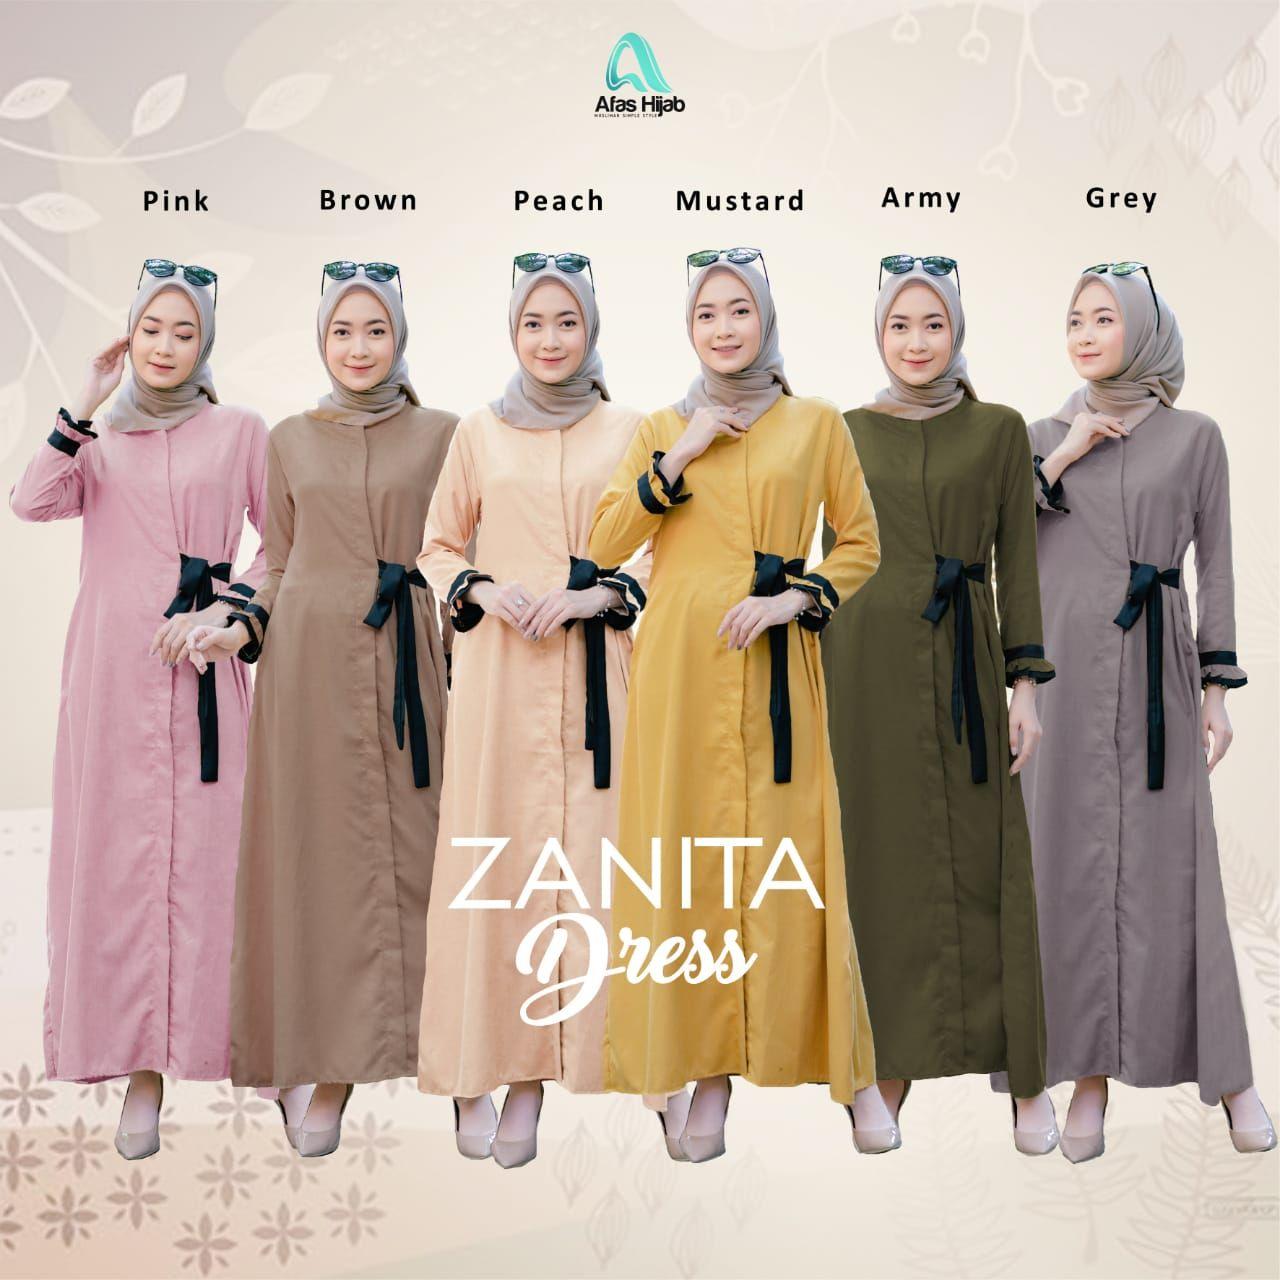 Bazar AB - ZANITA DRESS | Jual Beli Komunitas AB